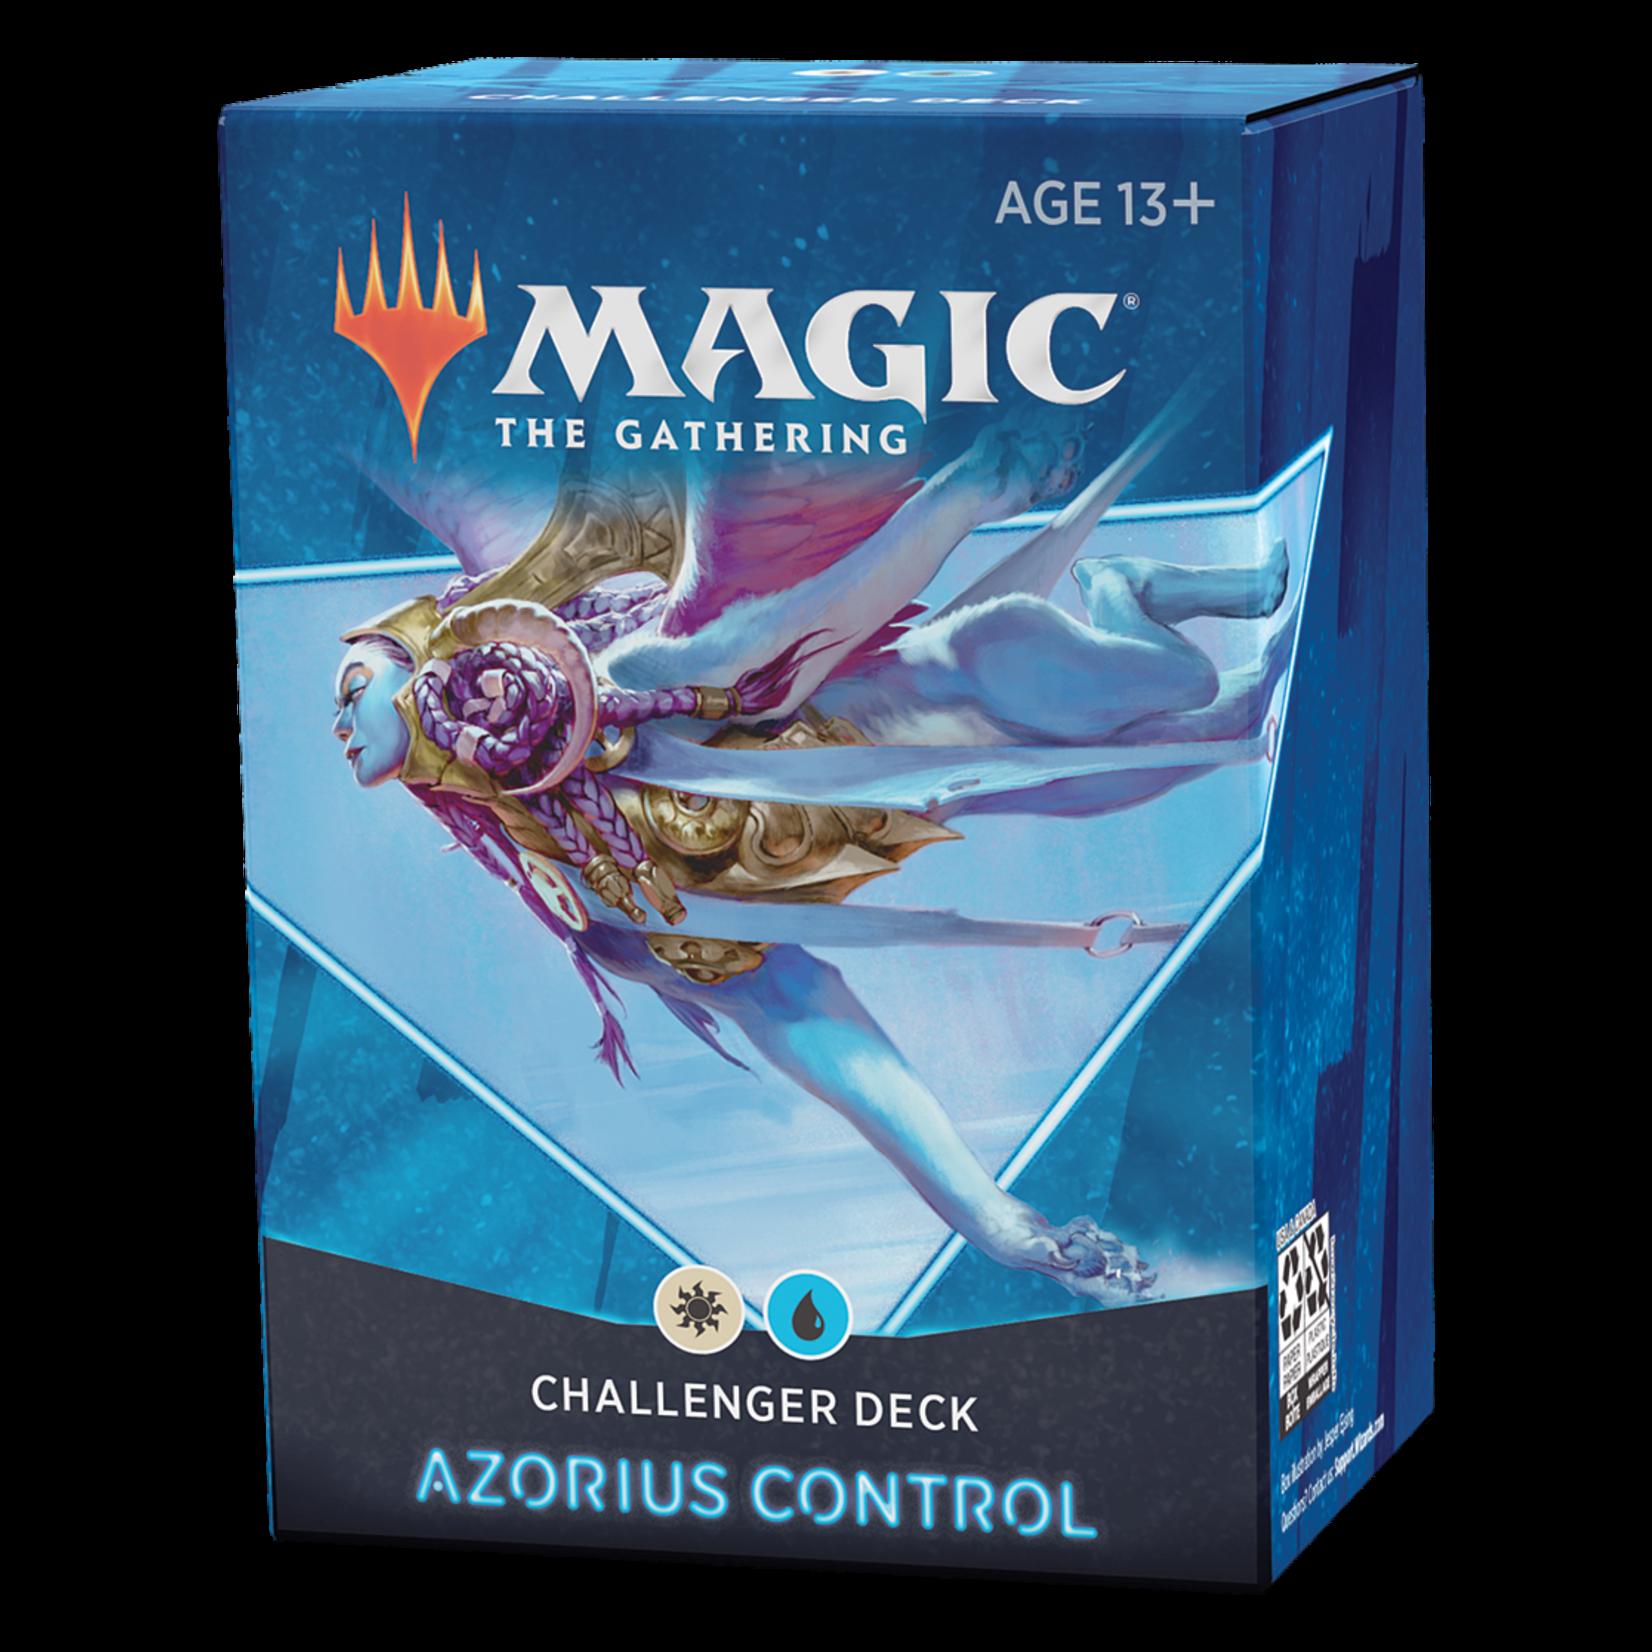 Magic: The Gathering Magic: The Gathering - Challenger Decks 2021 - Azorius Control